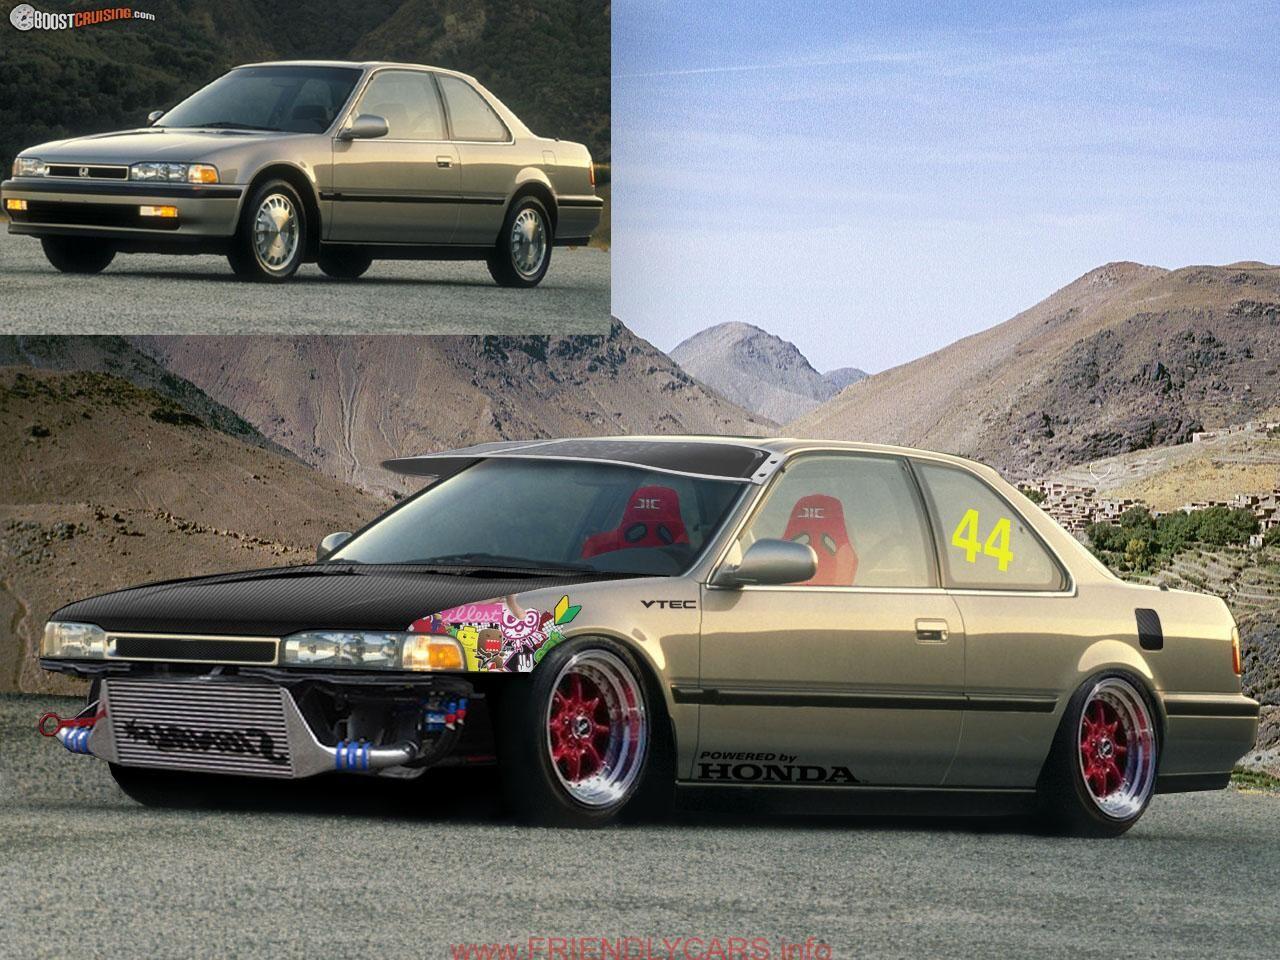 cool honda accord 2001 jdm car images hd Honda Accord